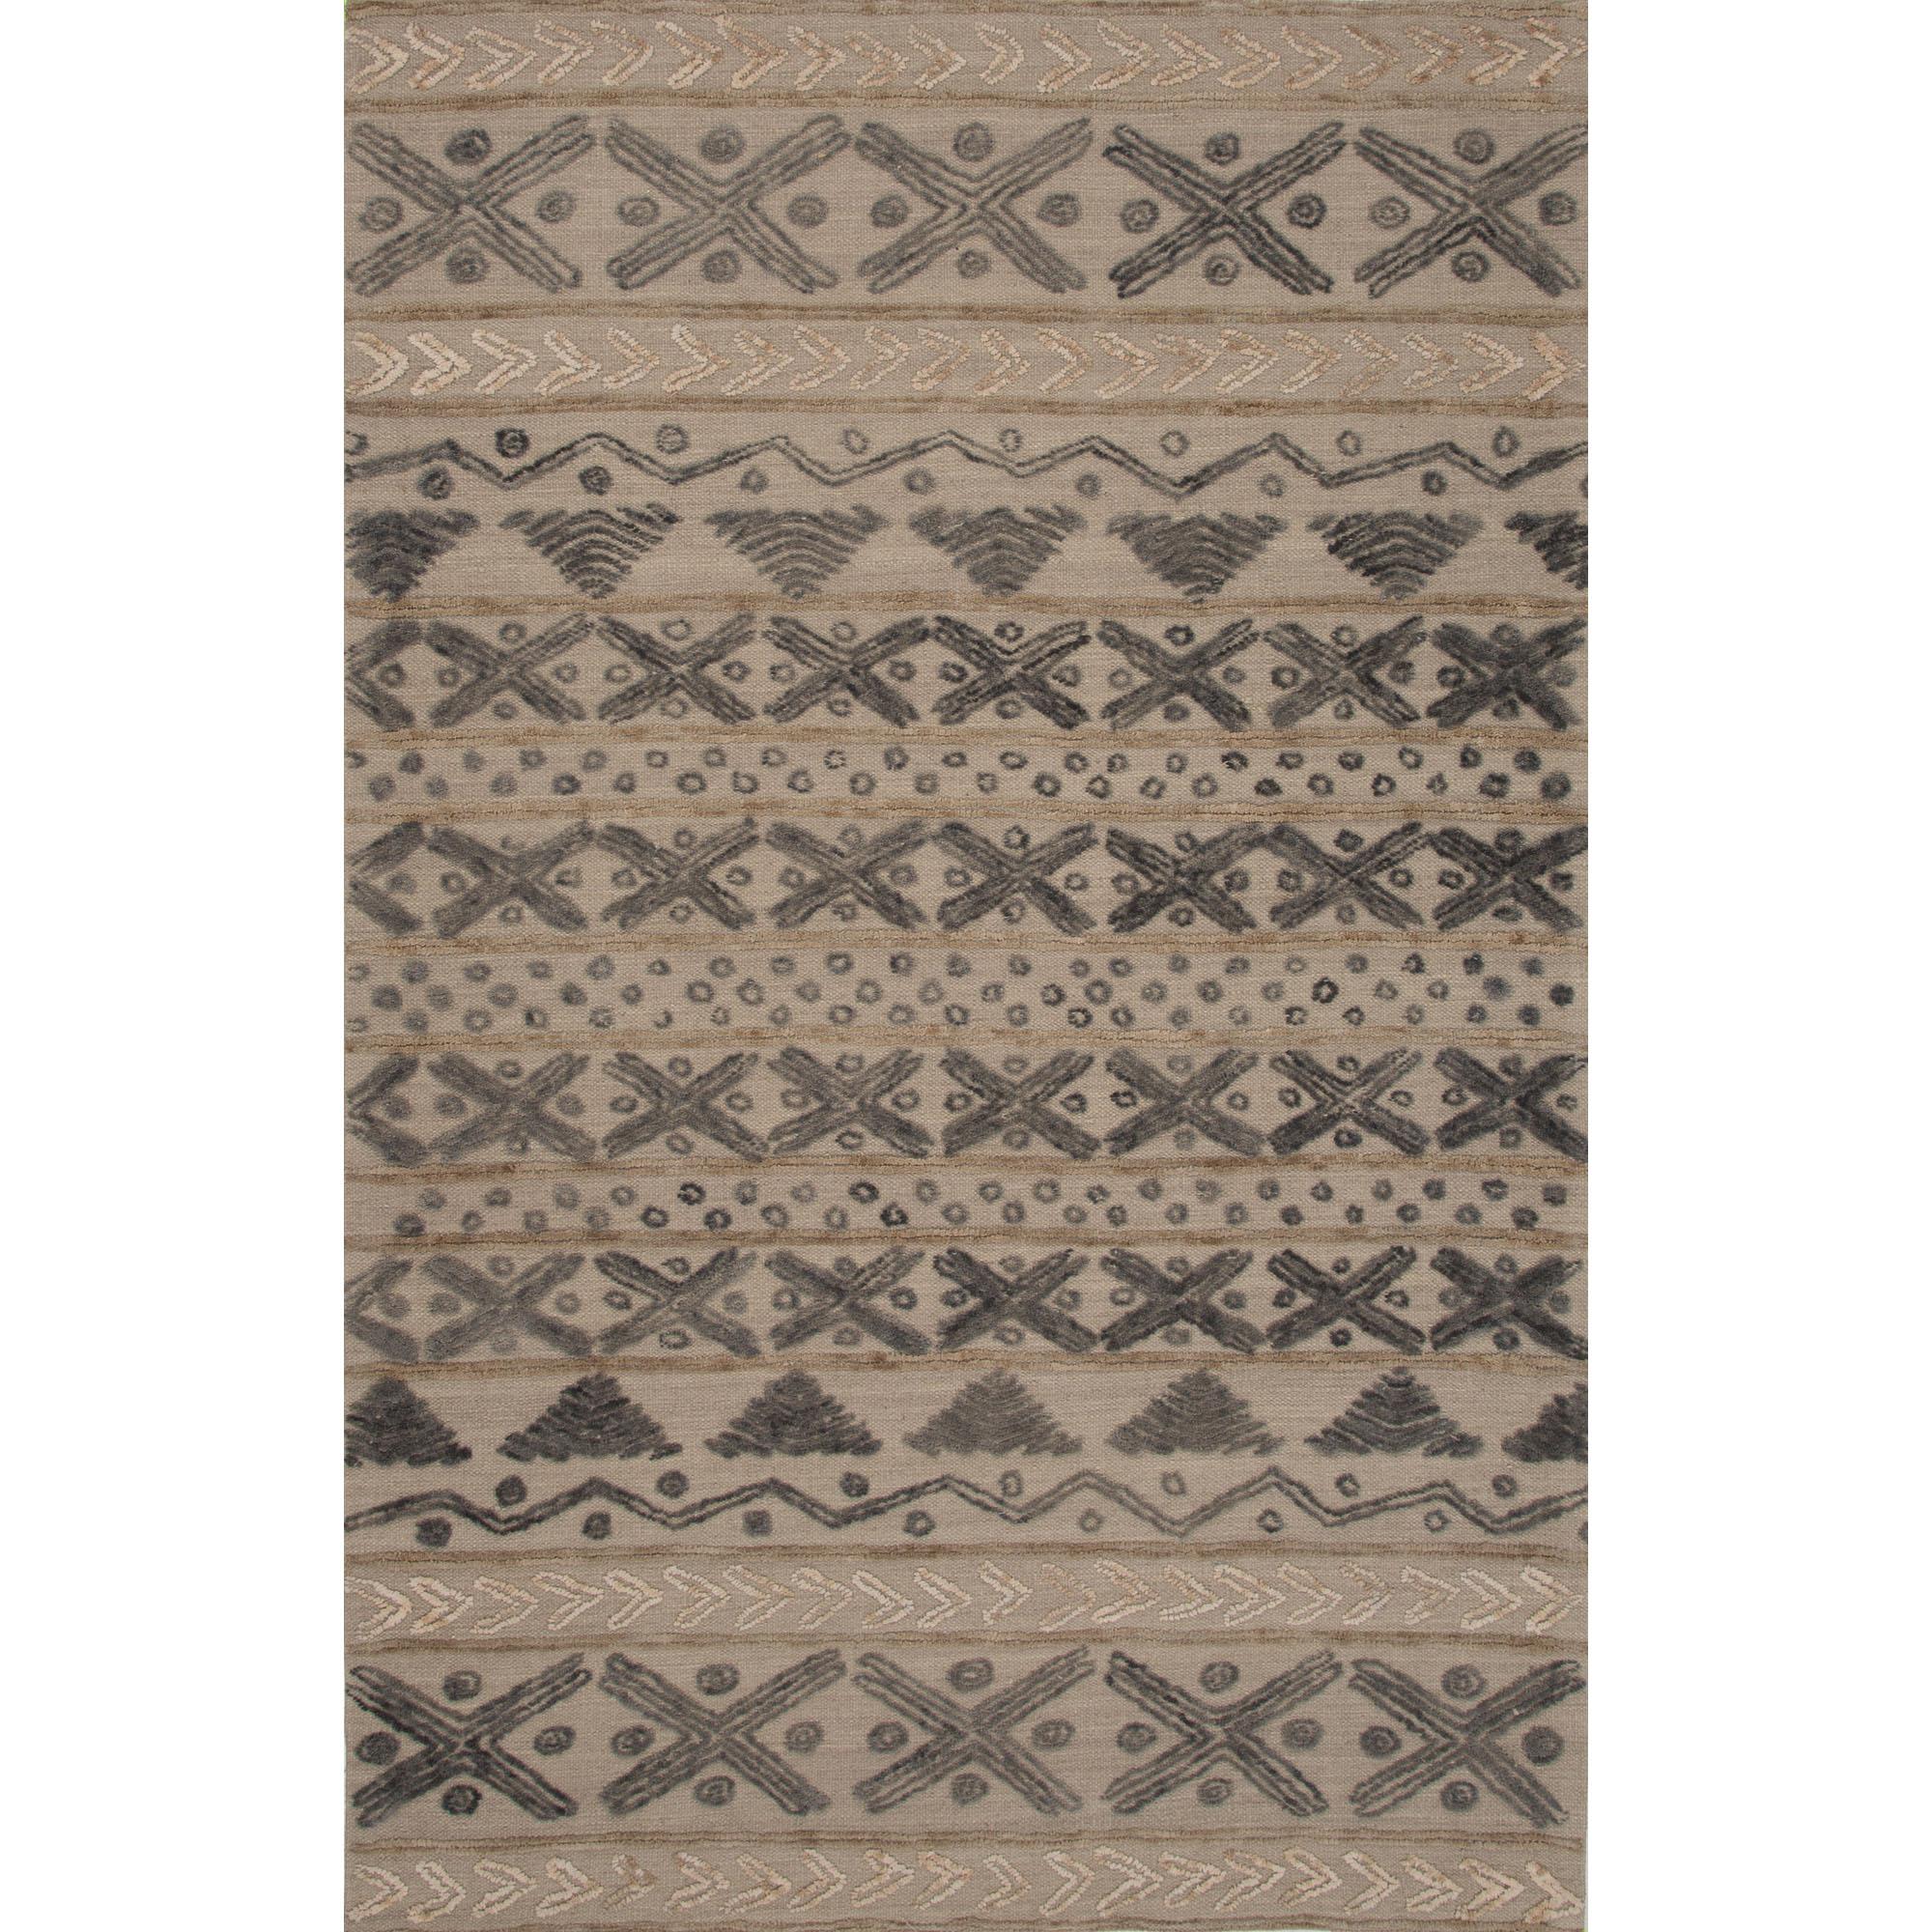 JAIPUR Rugs Stitched 5 x 8 Rug - Item Number: RUG121357